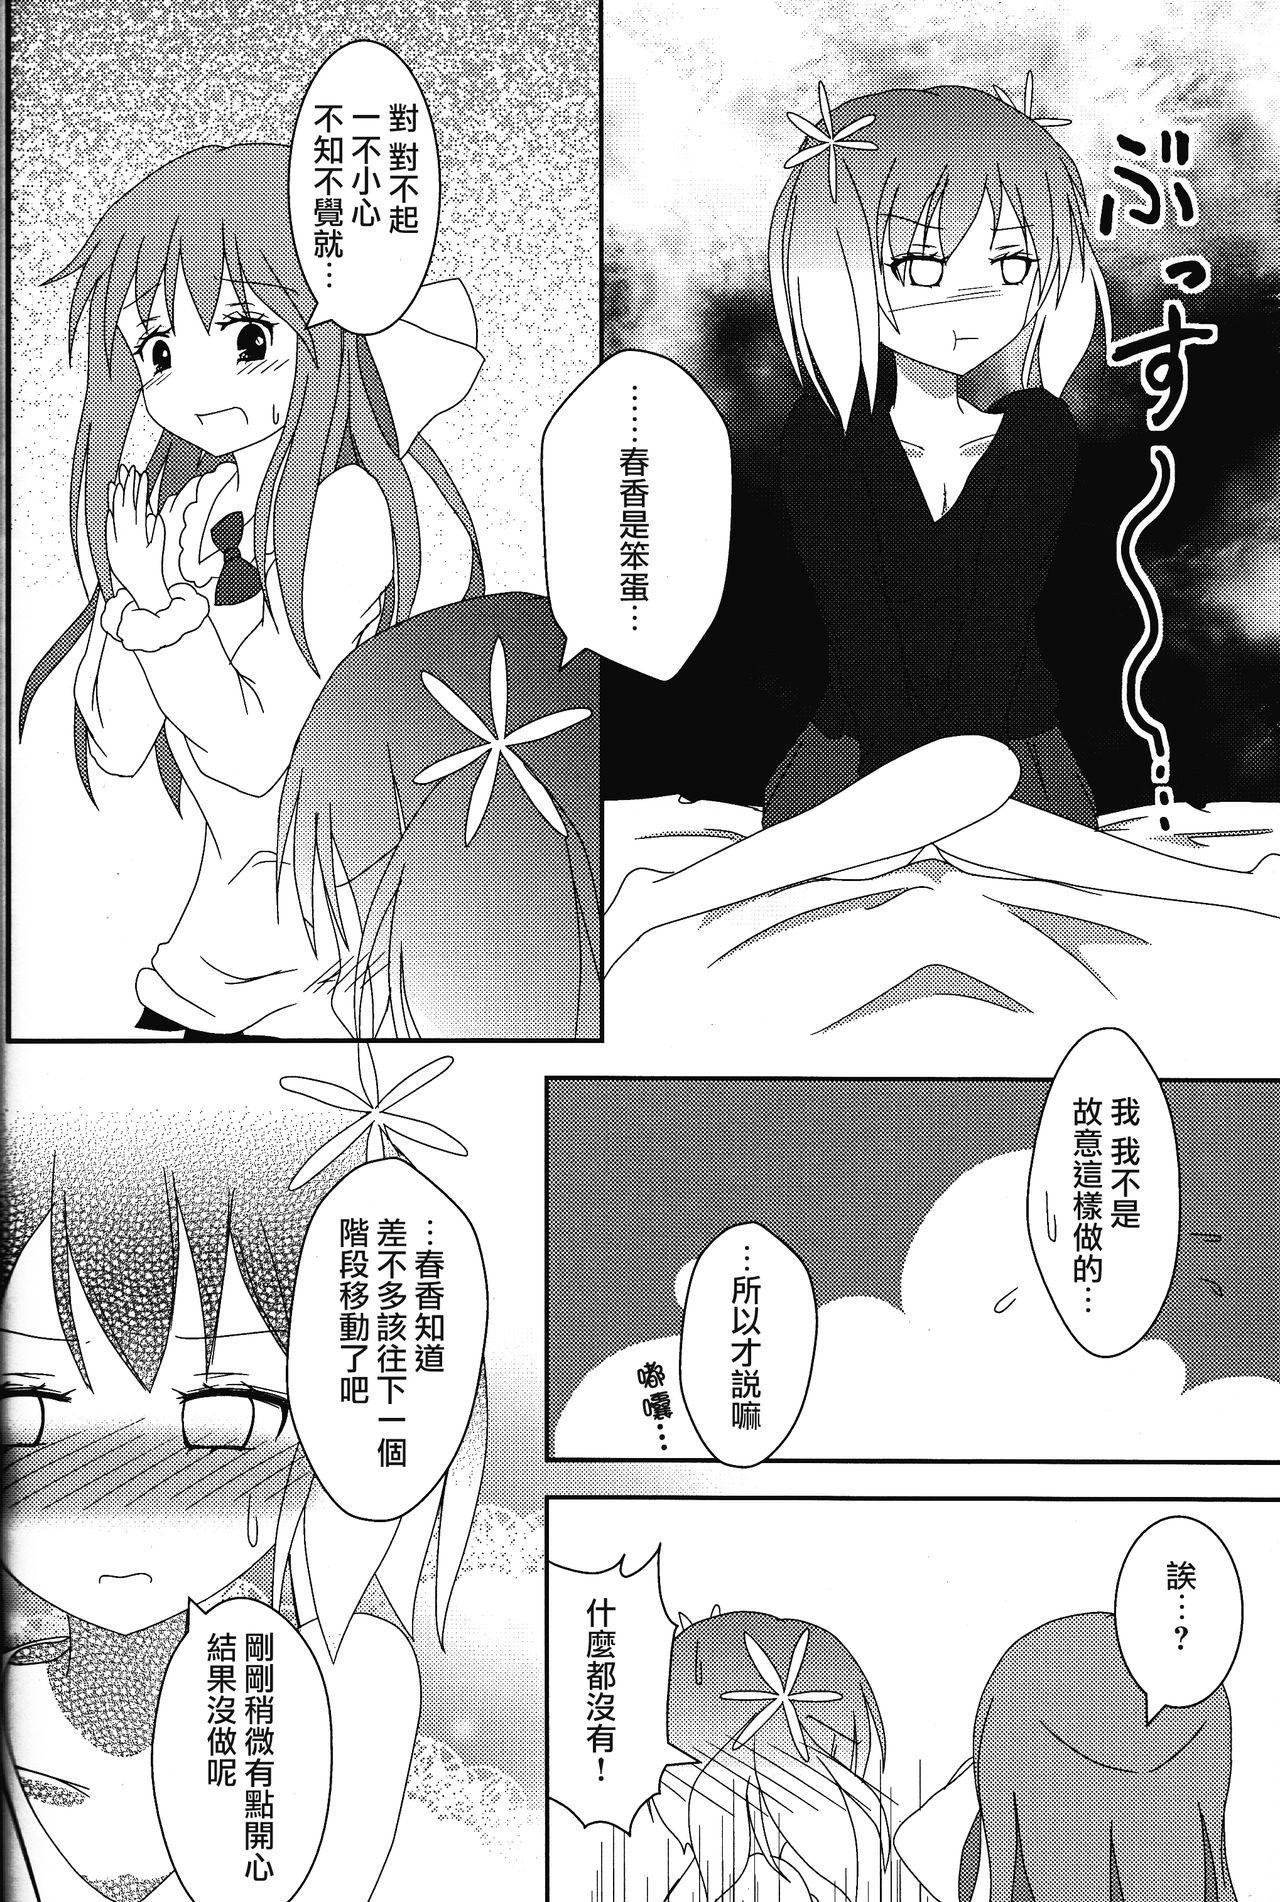 Yozakura Trick 6